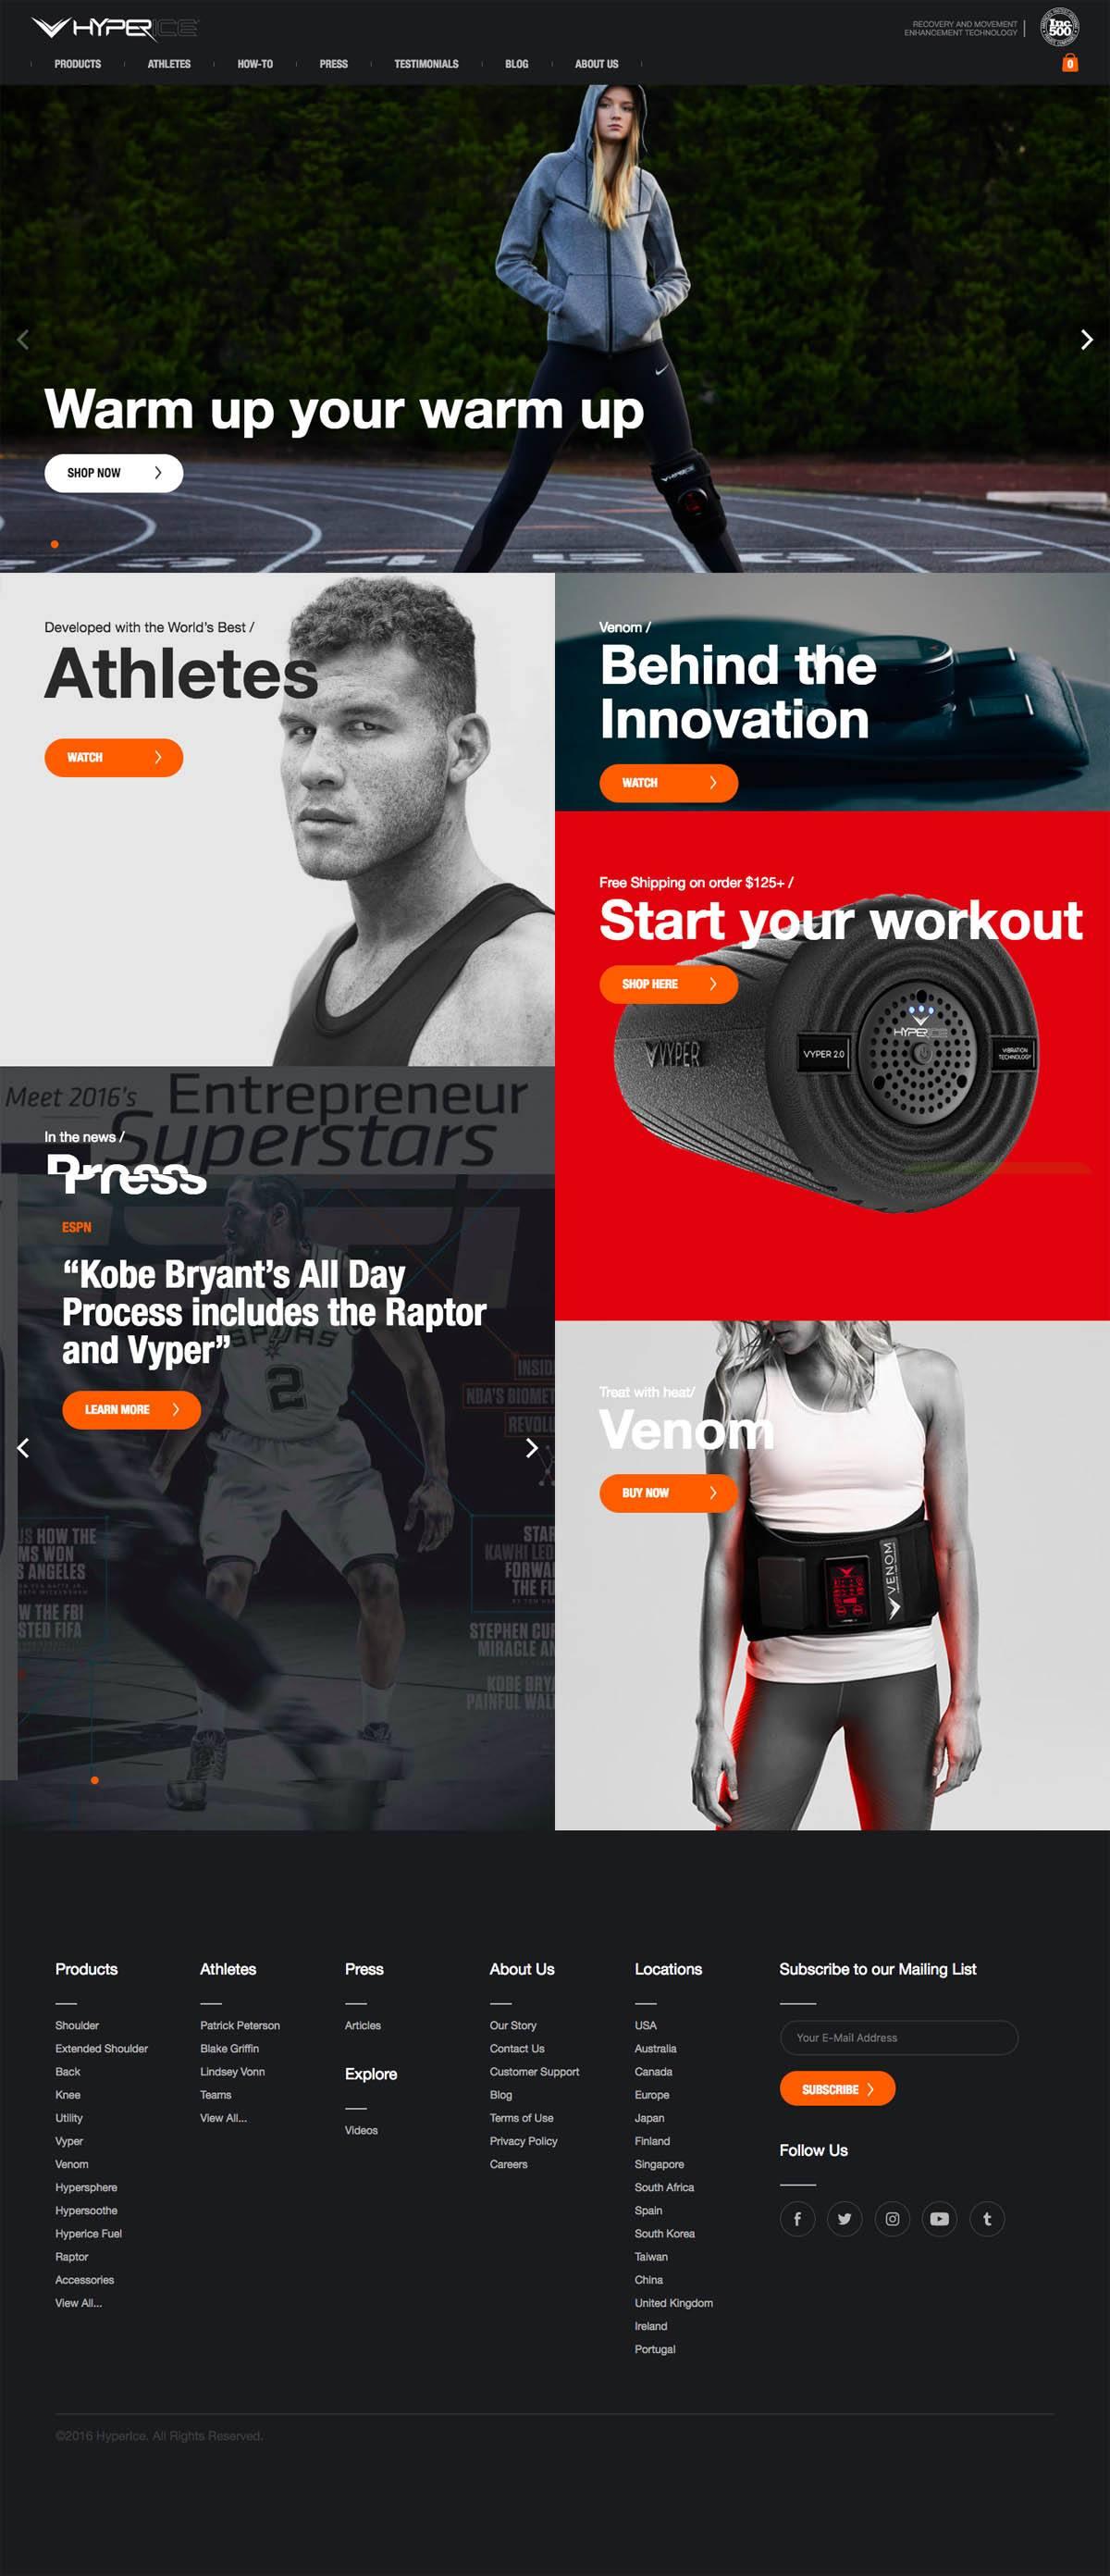 eCommerce website: Hyperice